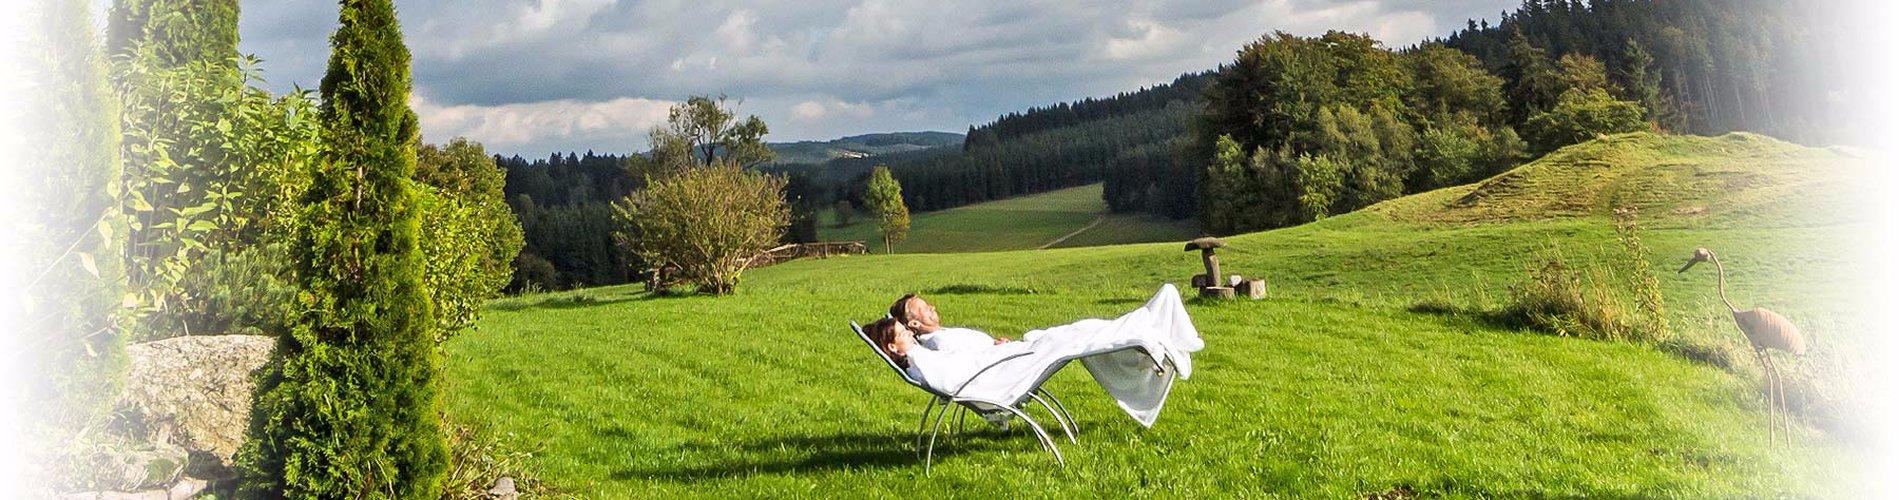 Carmen Klein, Single aus Graz, 07. Bezirk: Liebenau | austria